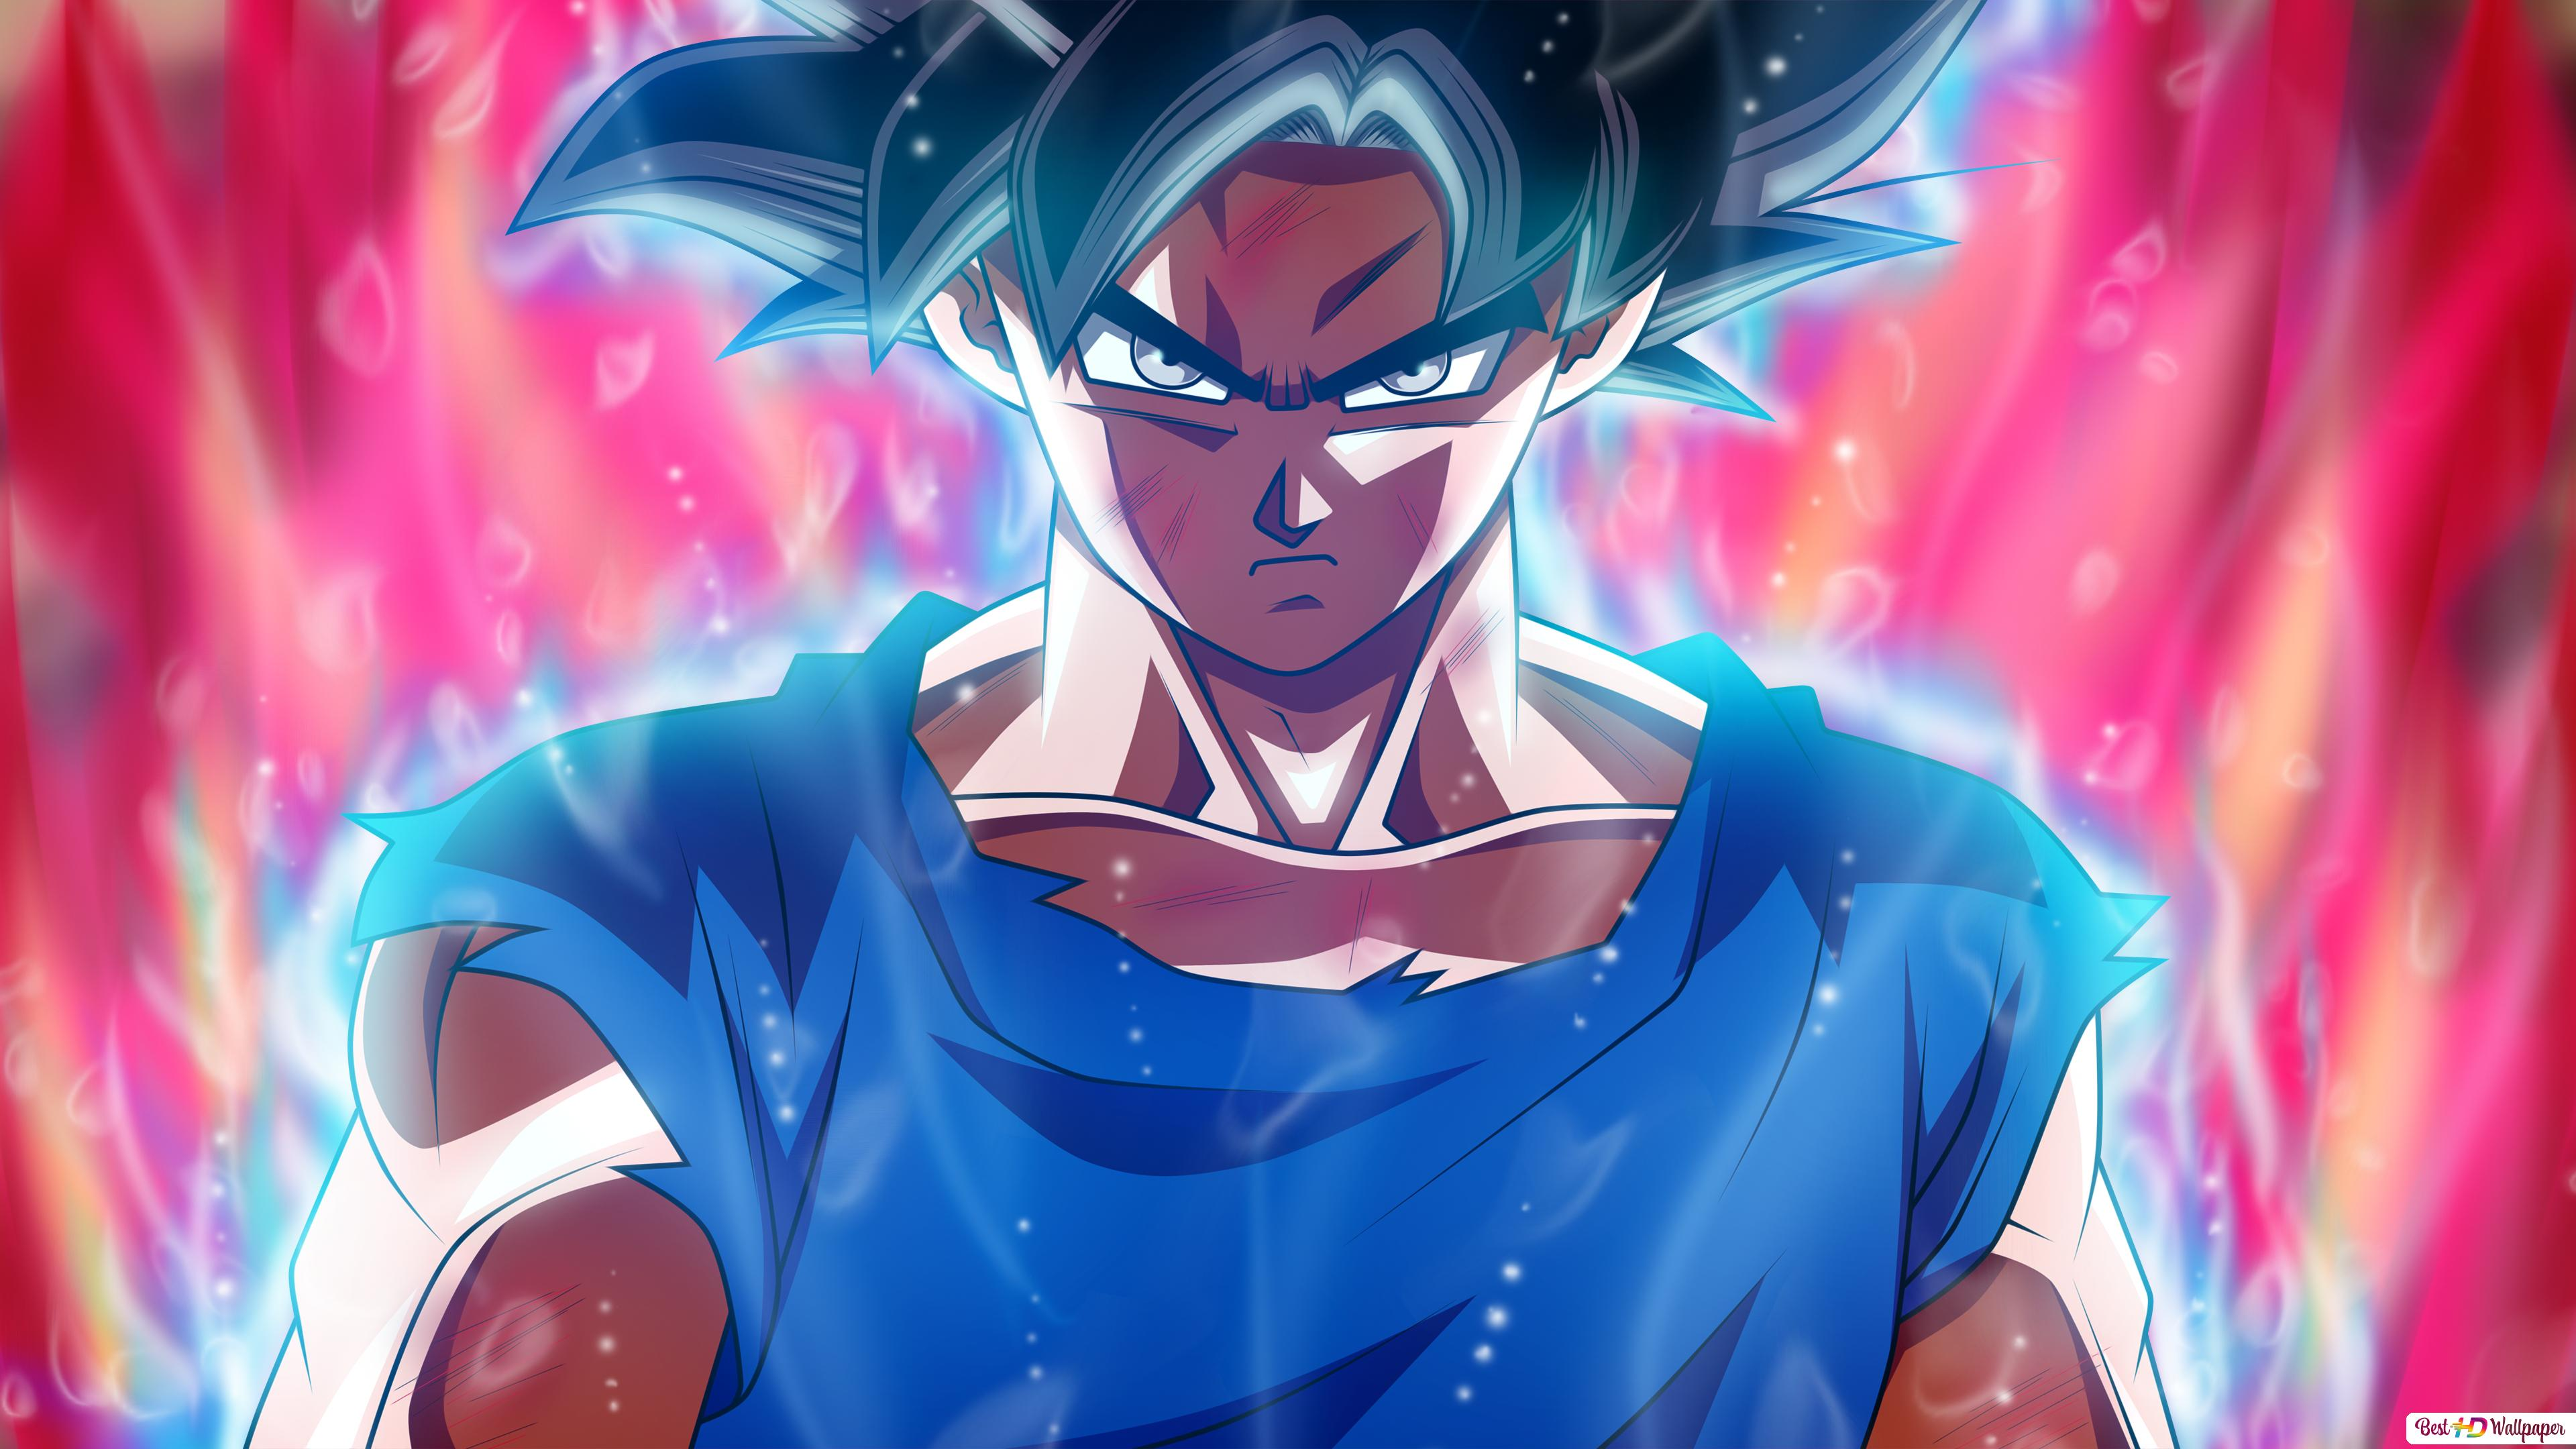 Goku Of Dragon Ball Z Hd Wallpaper Download